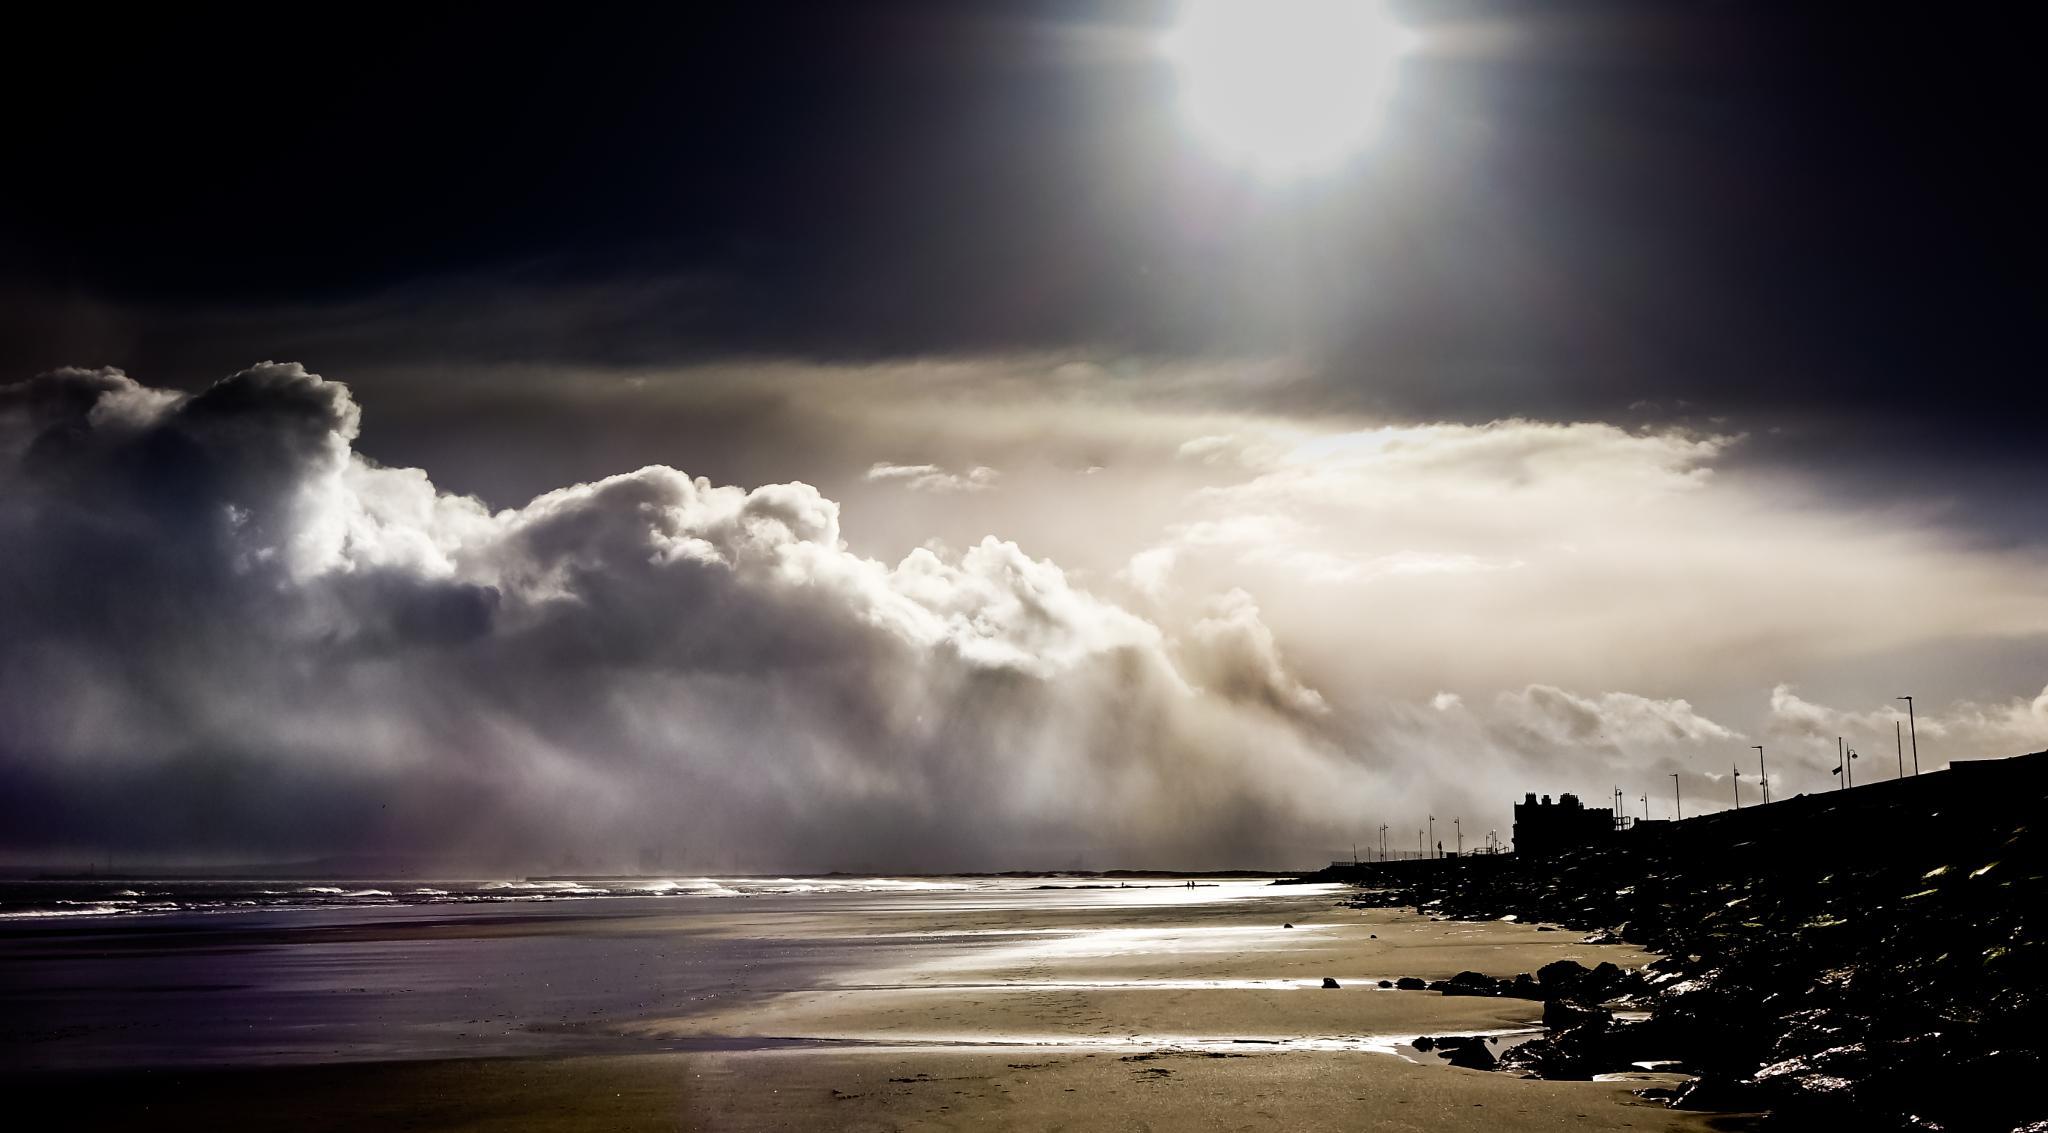 Threatening sky by Peter Edwardo Vicente.